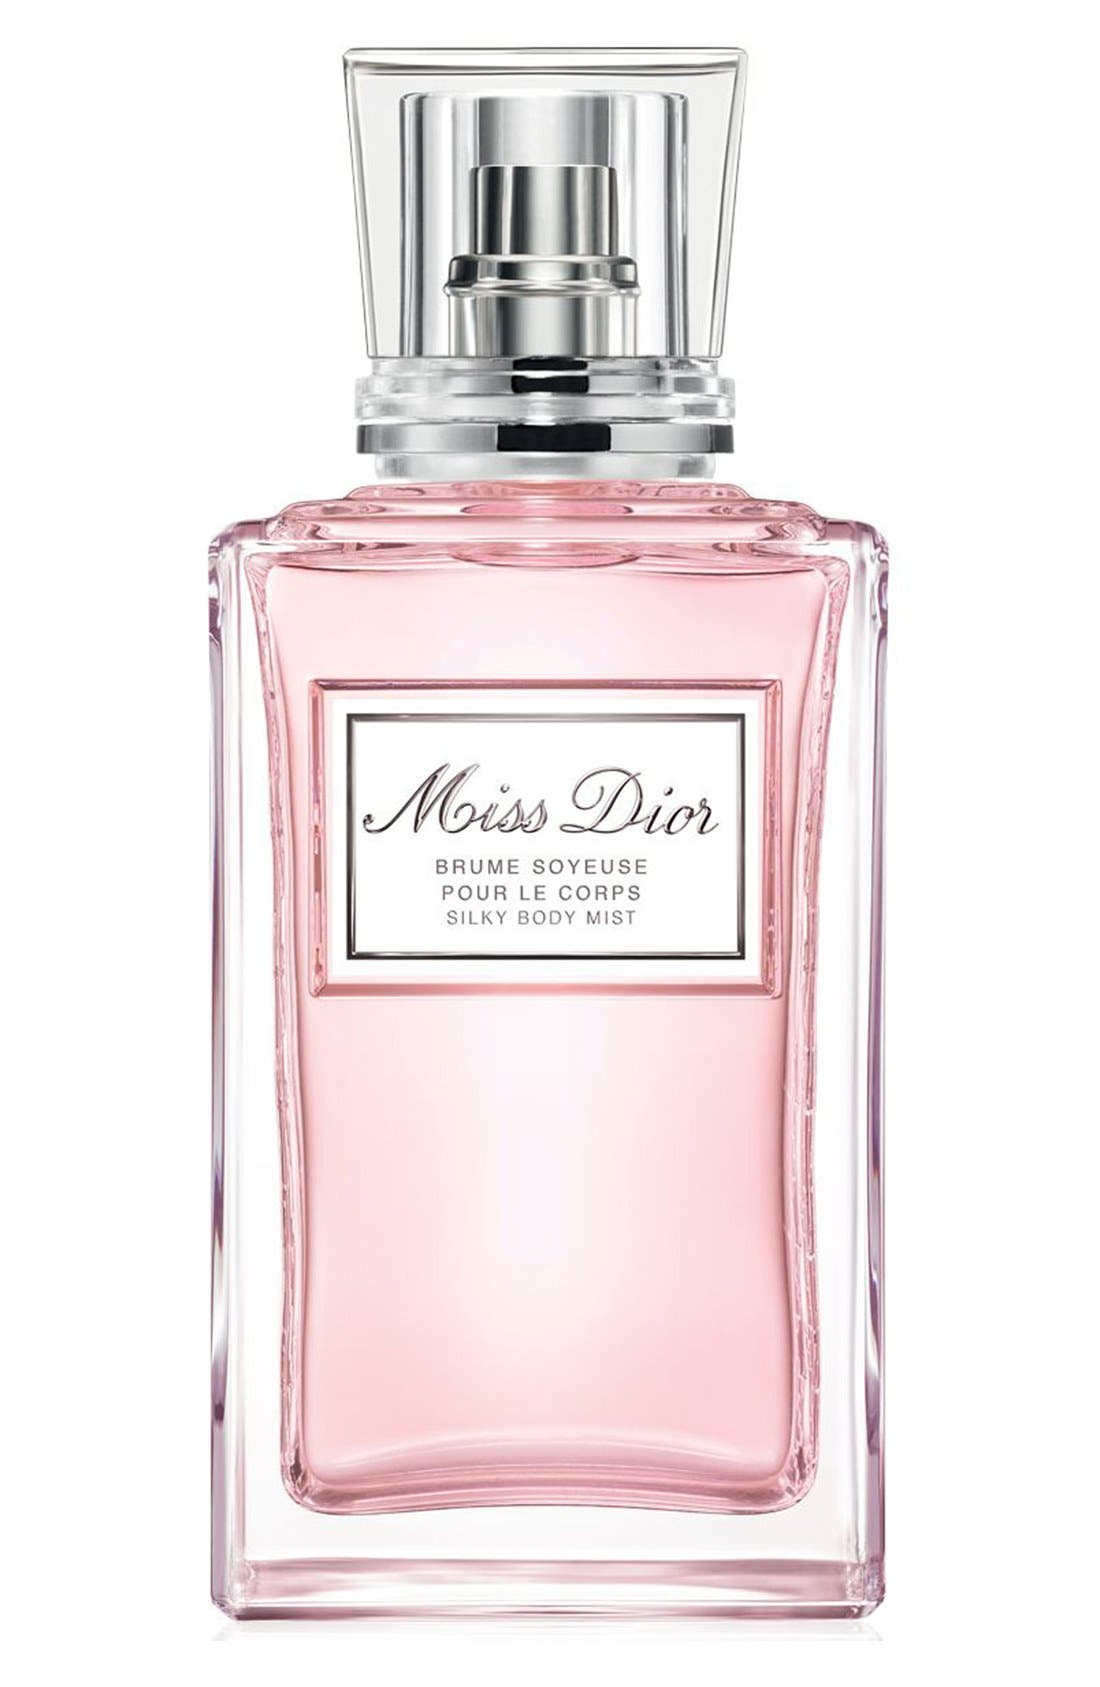 Womens Dior Perfume Nordstrom